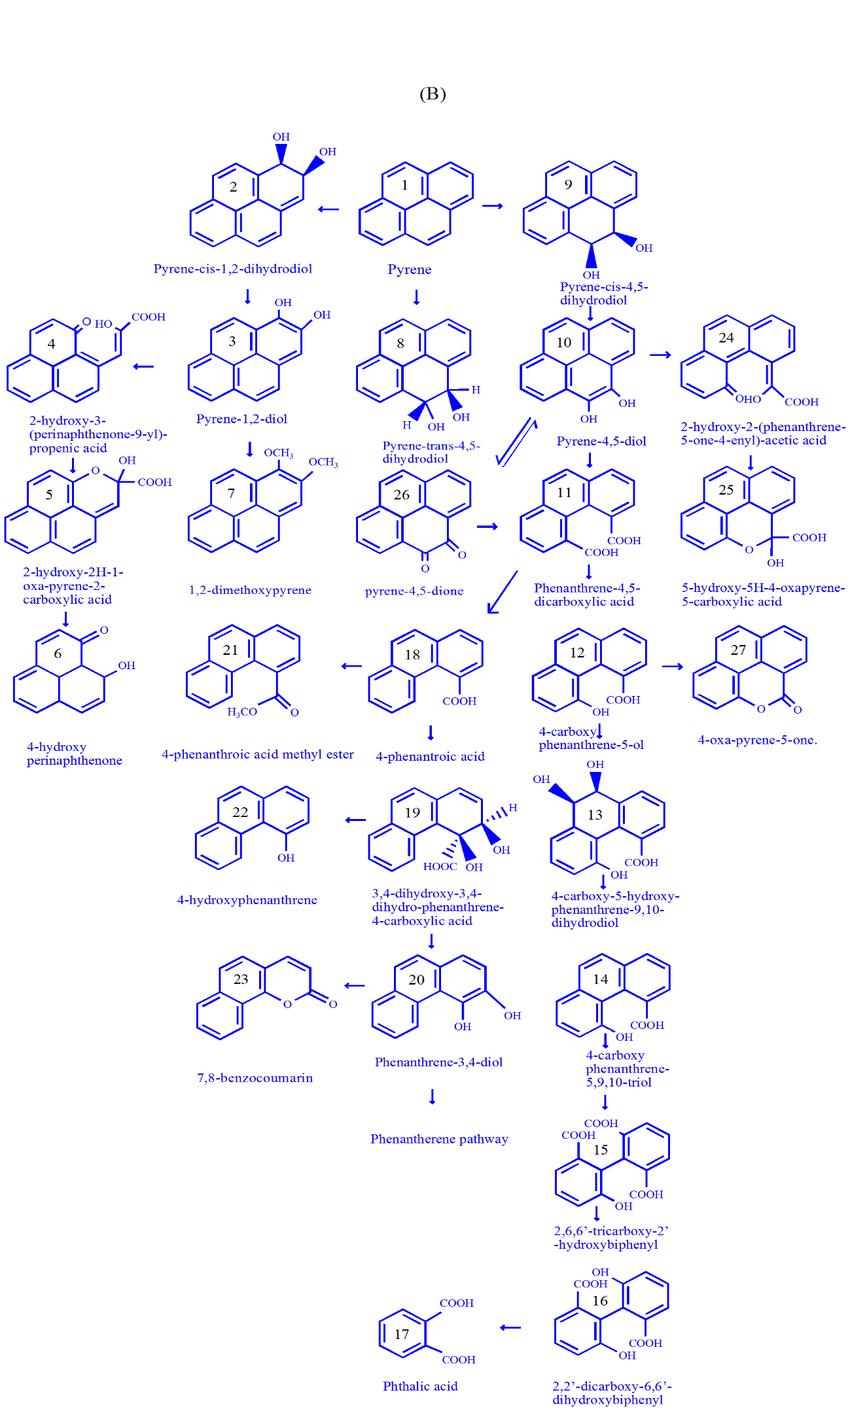 medium resolution of  a catabolism of phenanthrene using microorganism b catabolism of pyrene using microorganism